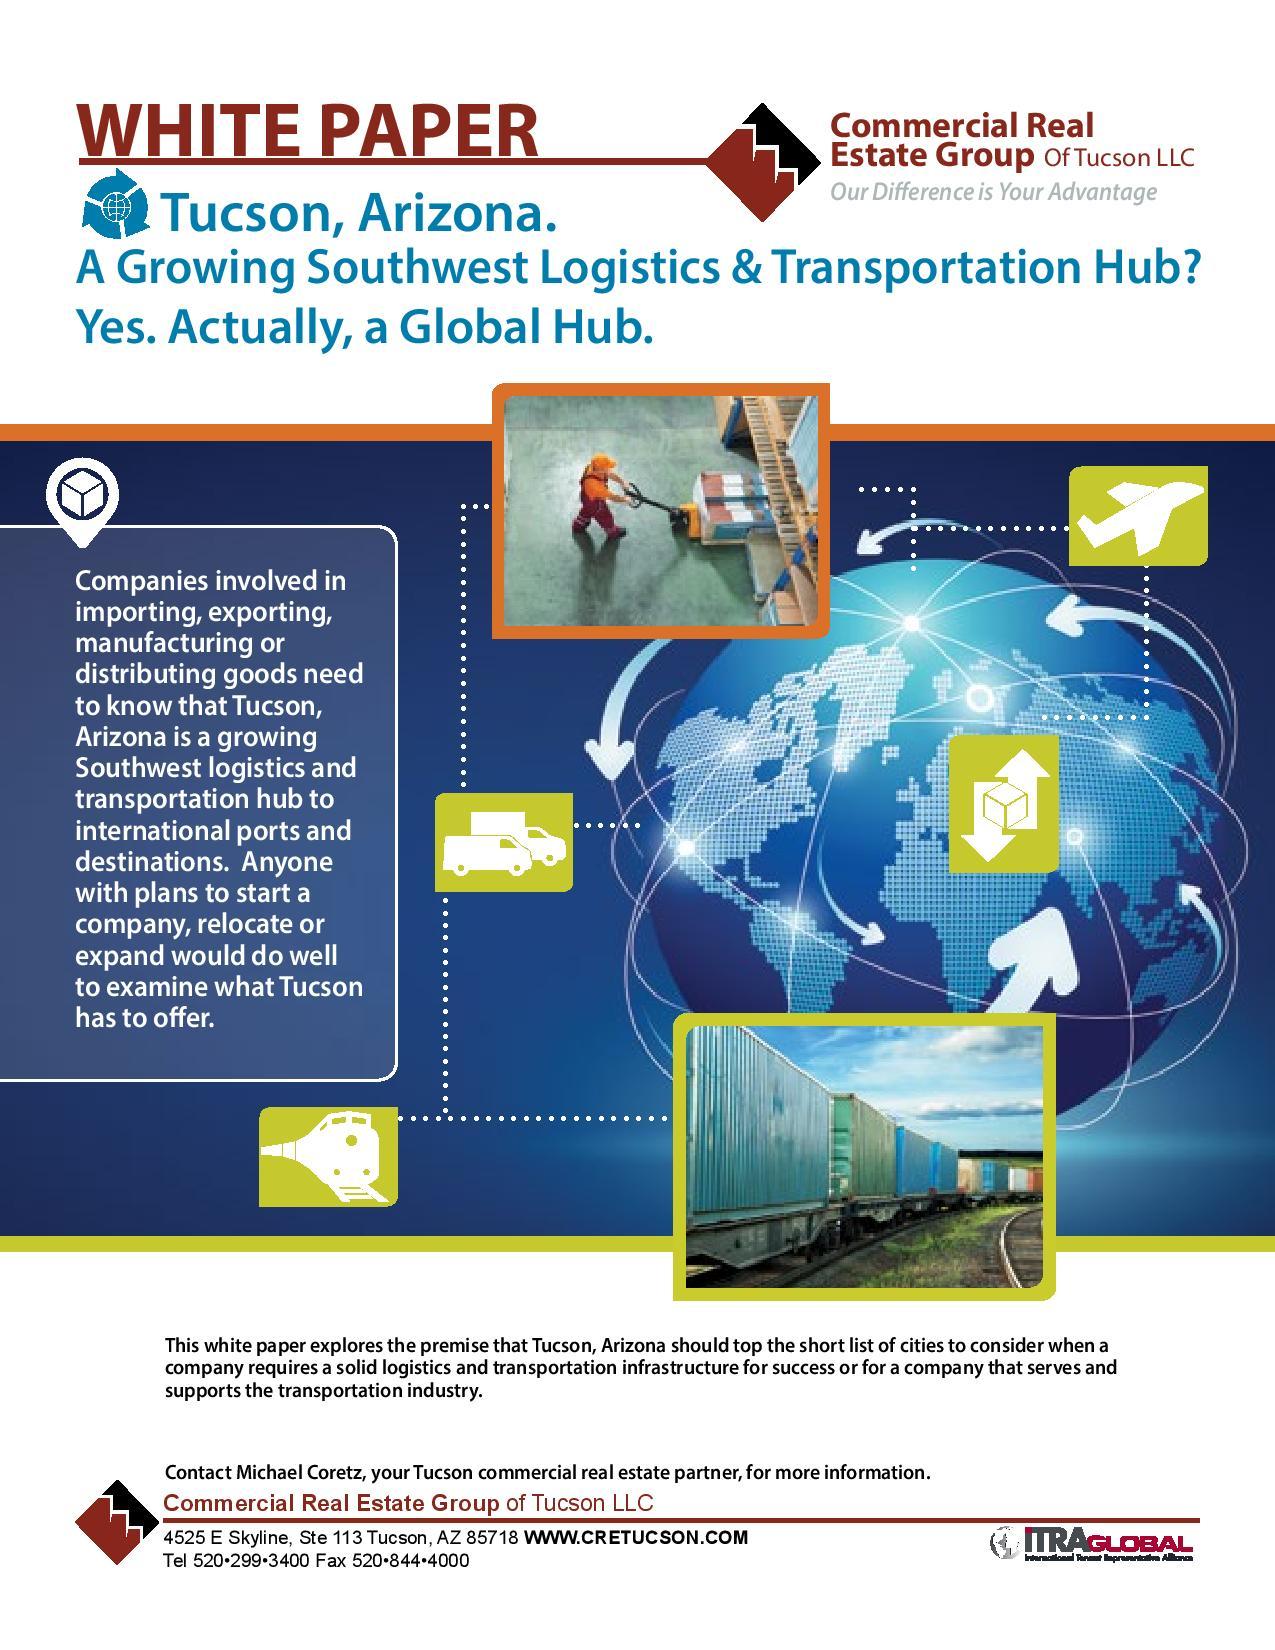 2014 Logistics & Transportation in Tucson Arizona Industrial Whitepaper (IMG)